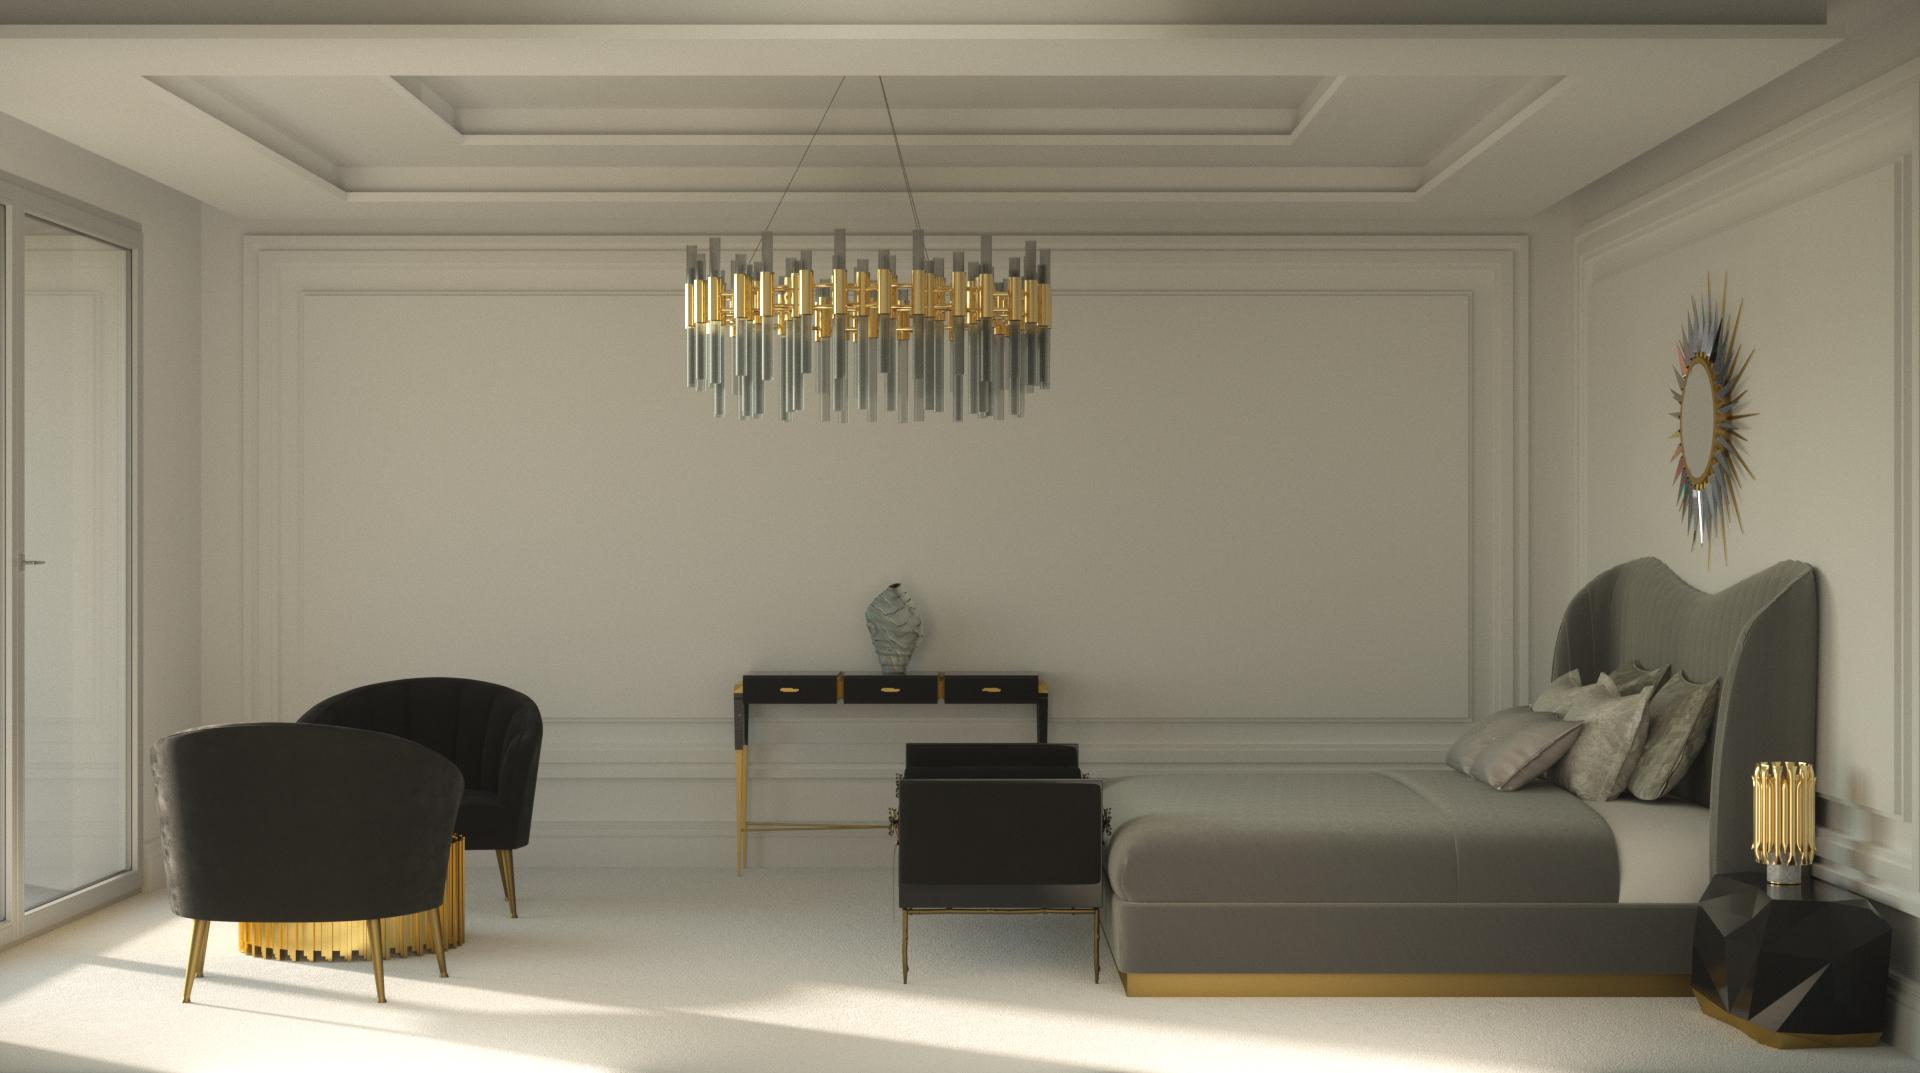 lighting interiors. The Importance Of Lighting In Interiors